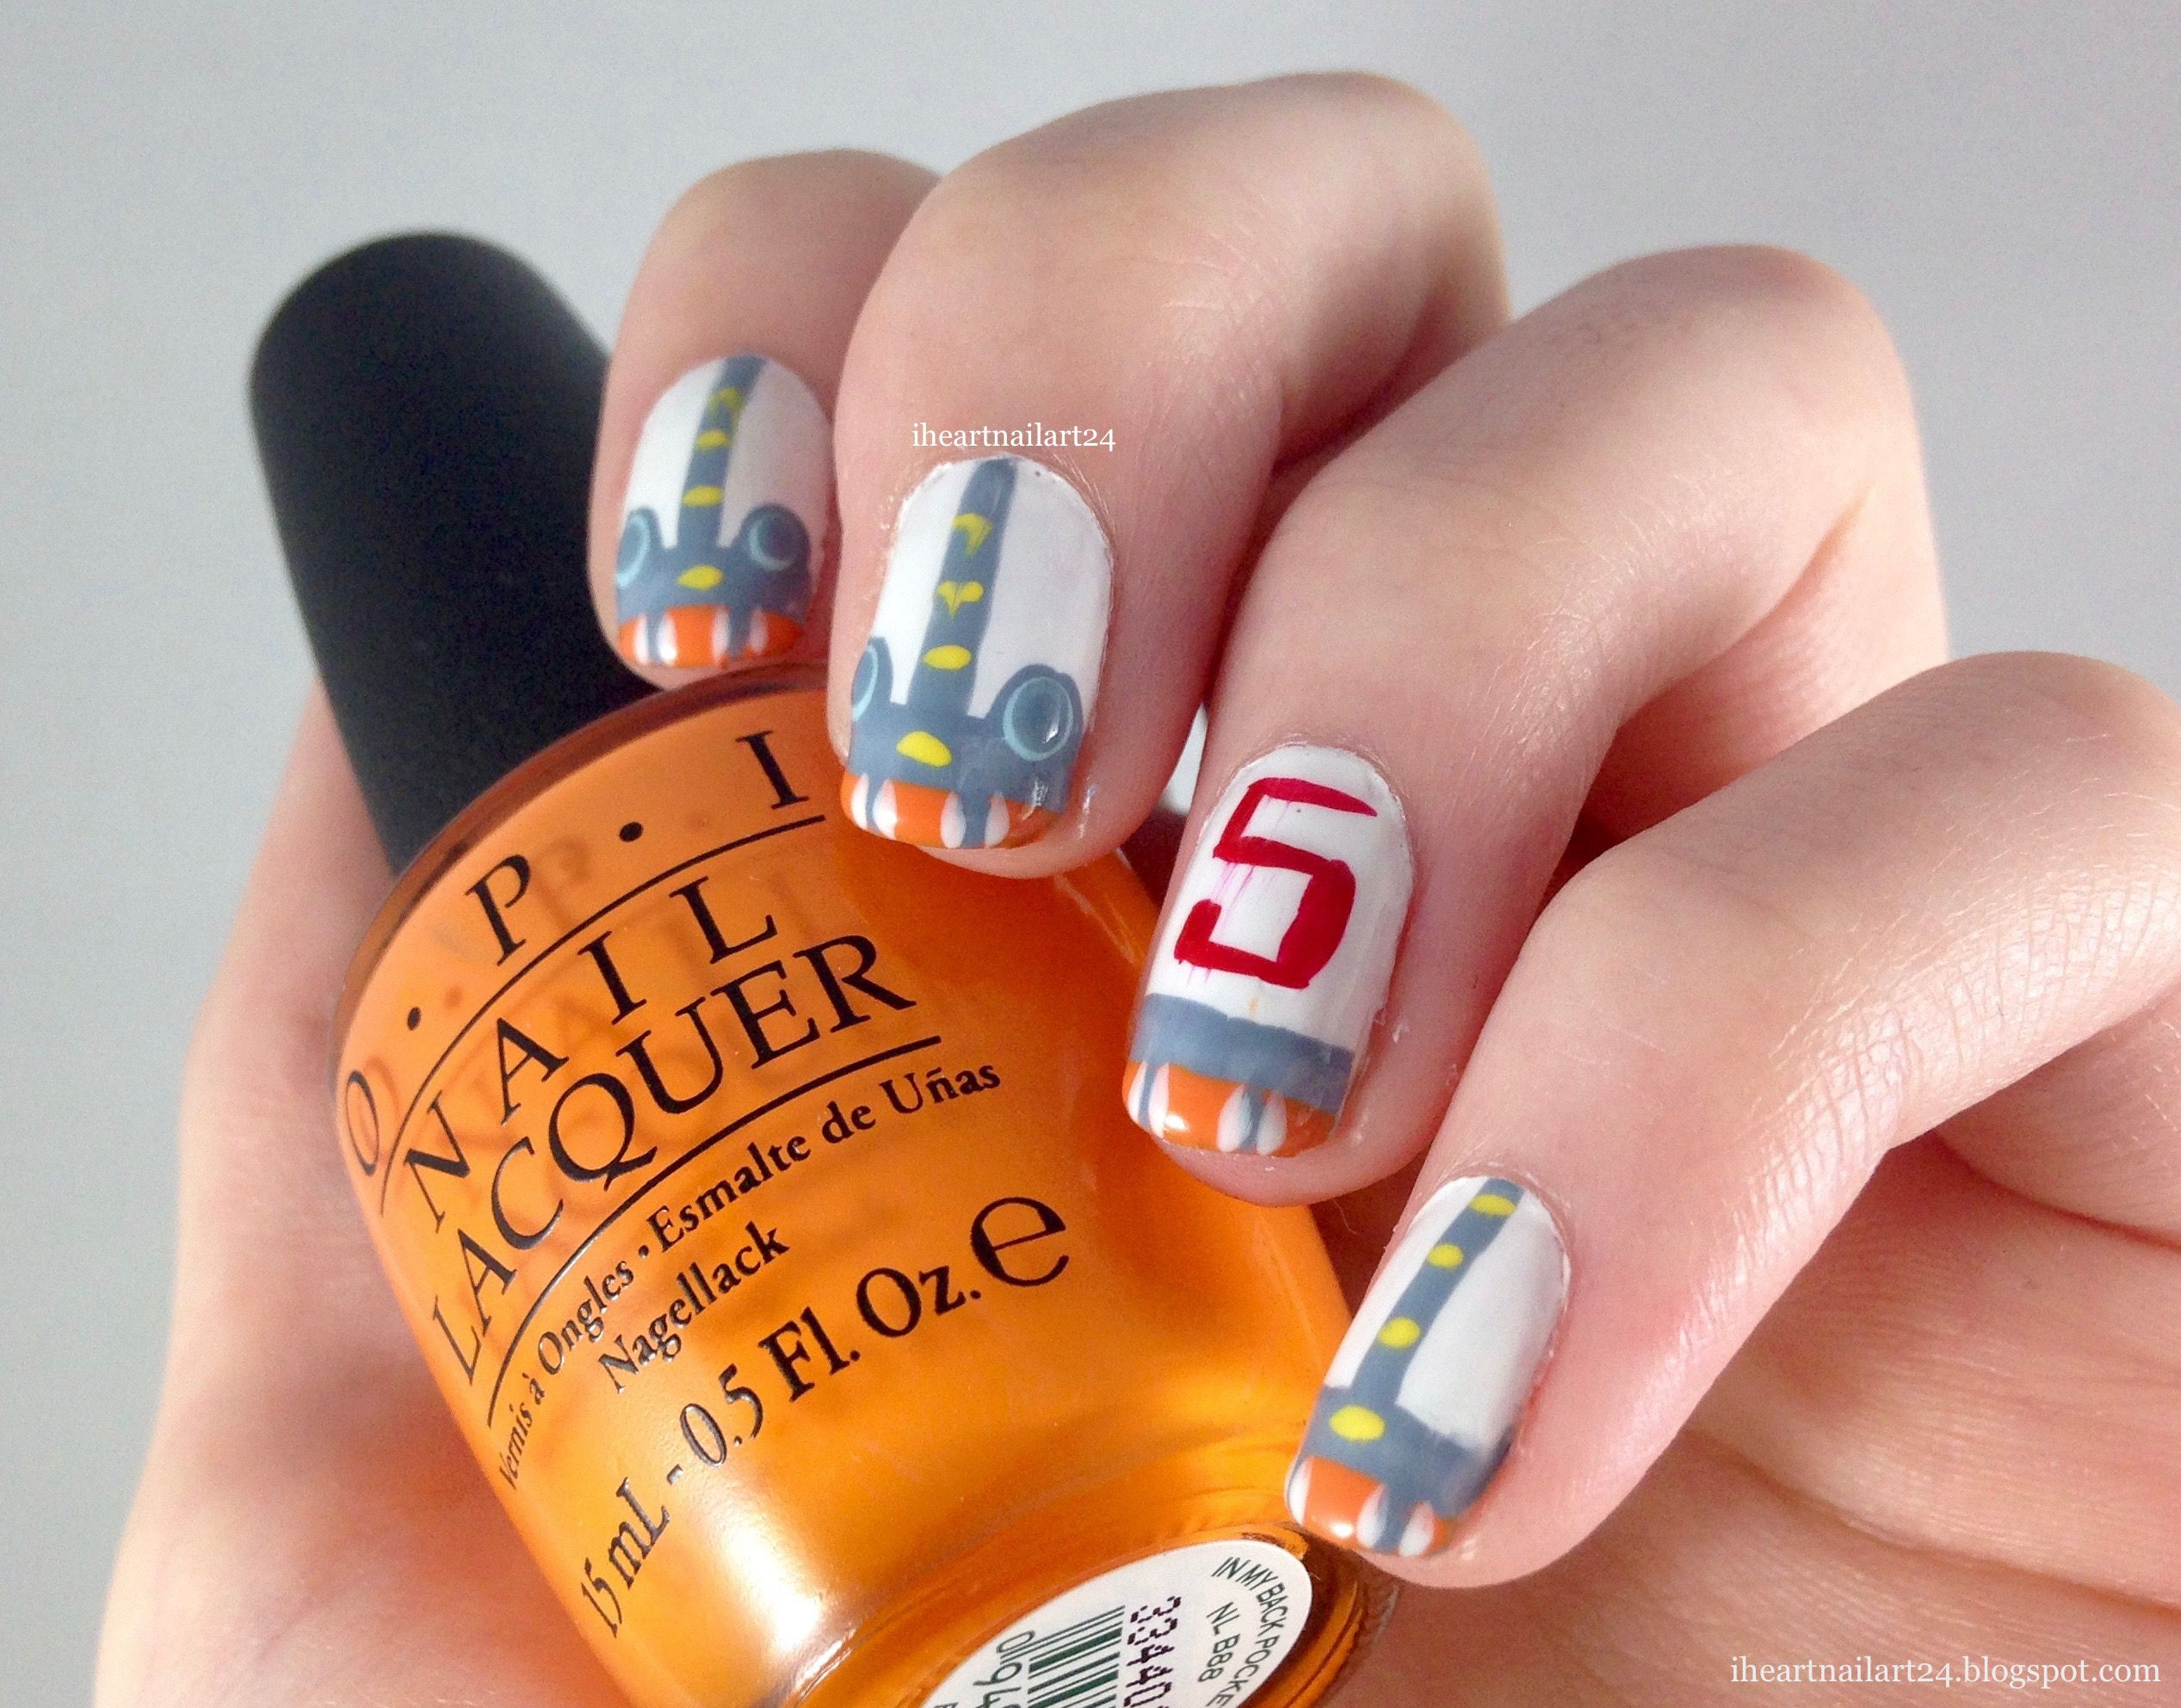 Subnautica Lifepod Inspired Nail Art. Makeup nails art